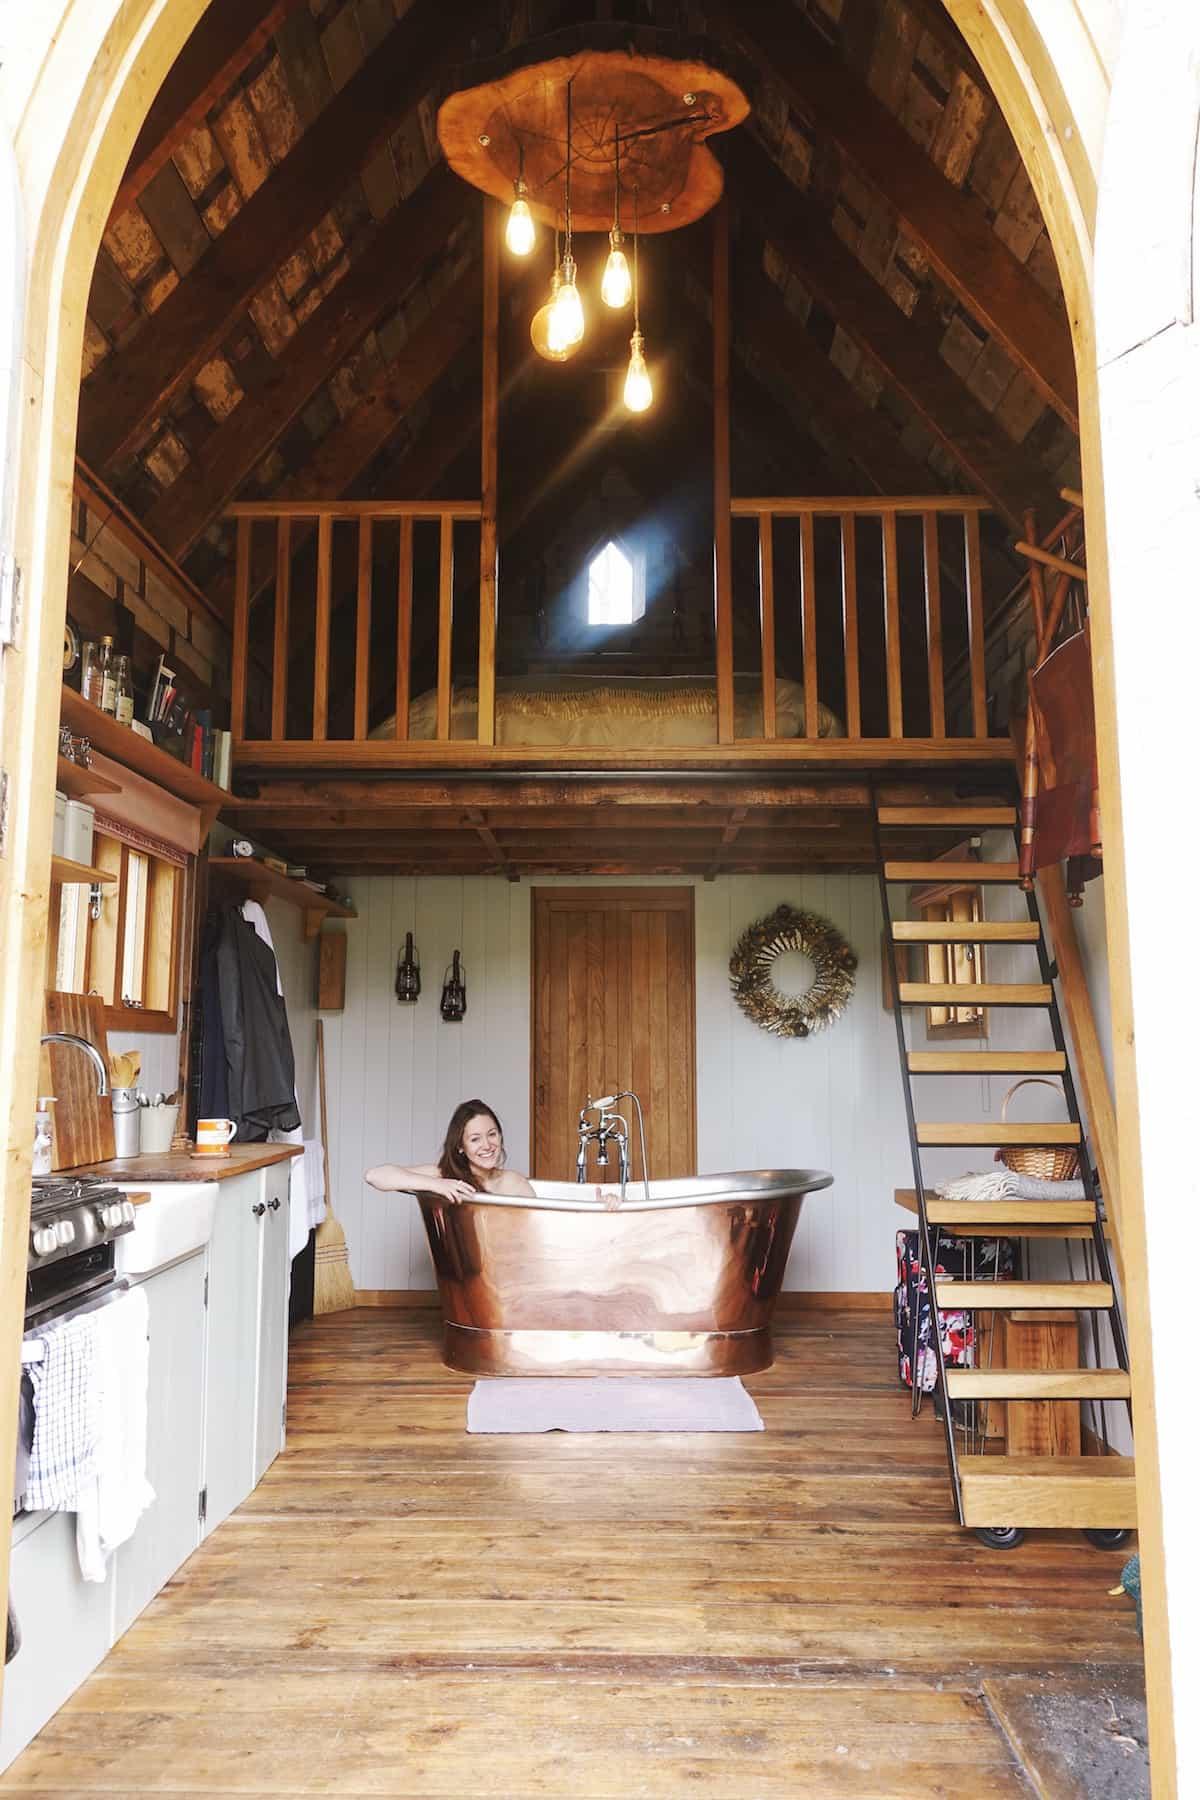 hesley huts holly bathtub